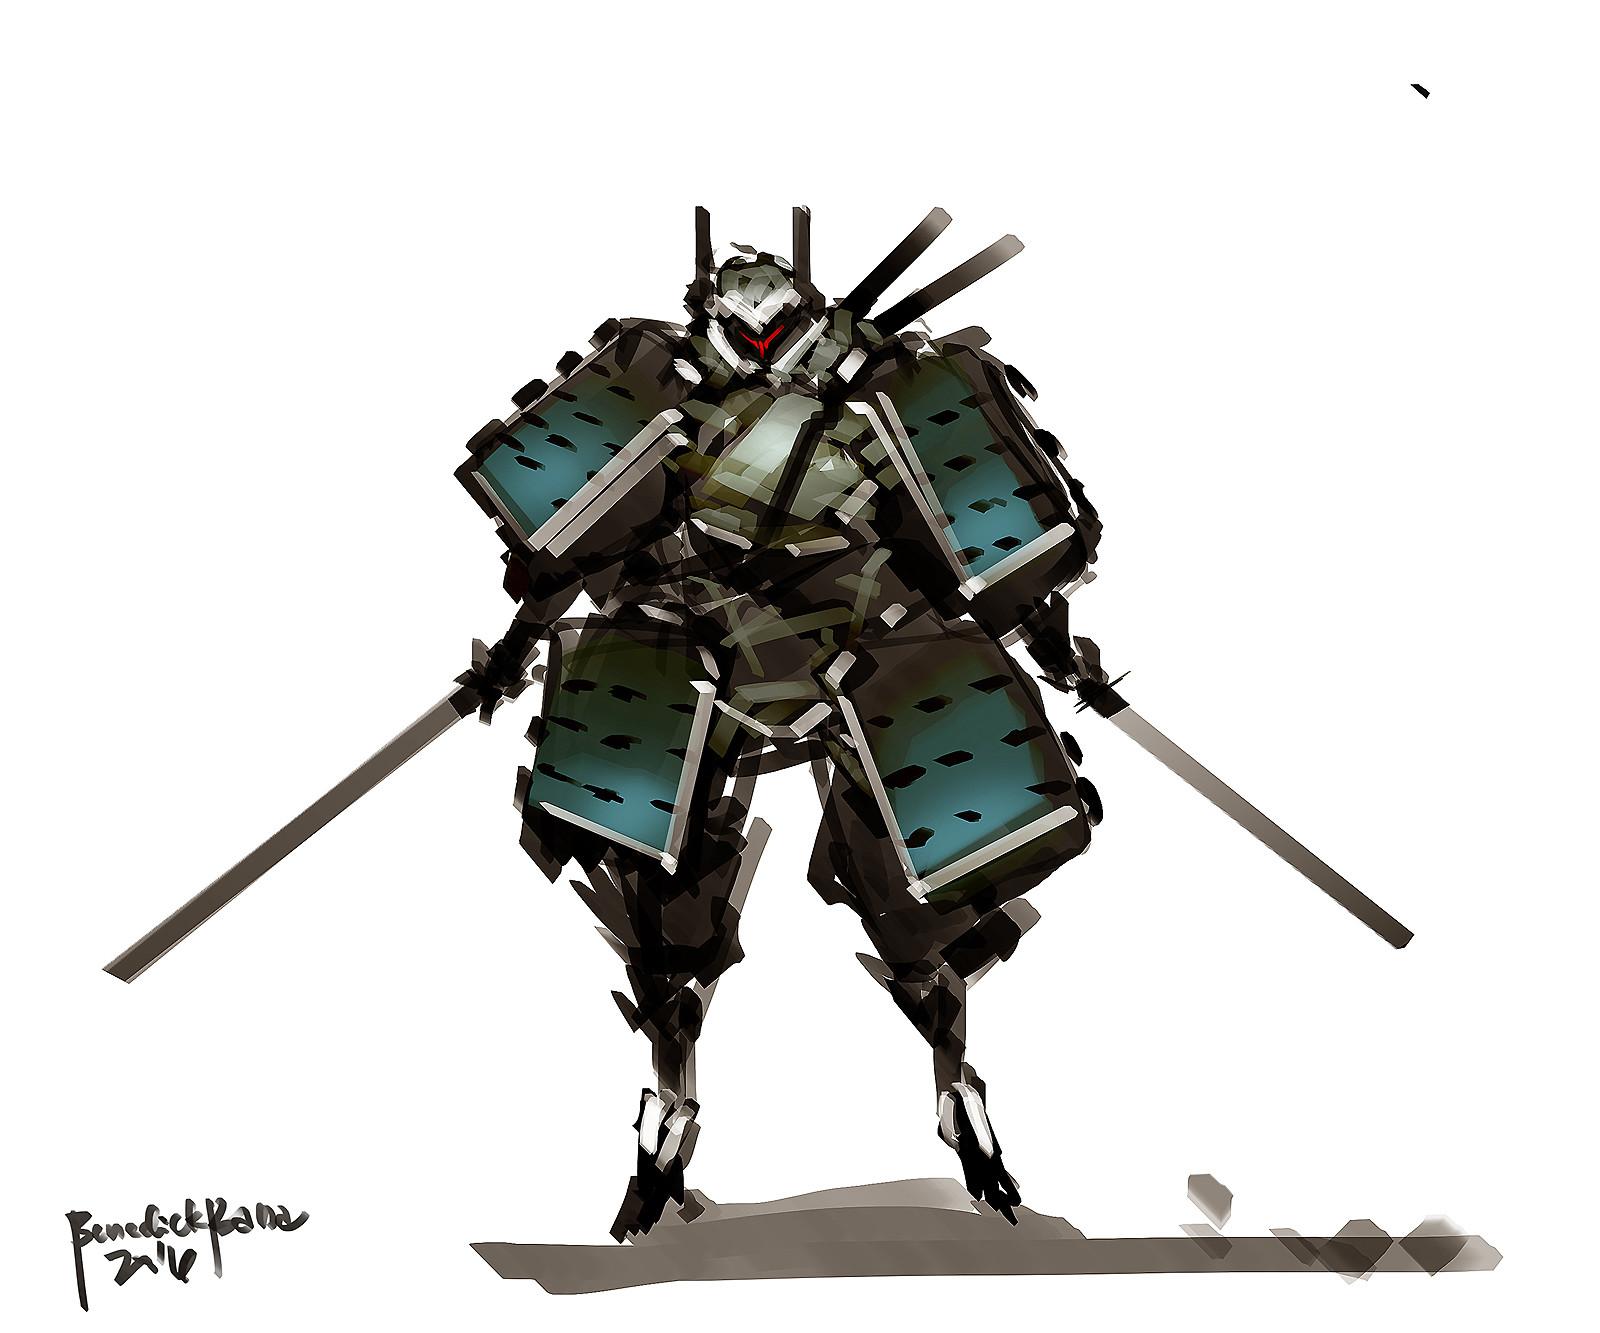 Benedick bana samurai merc lores